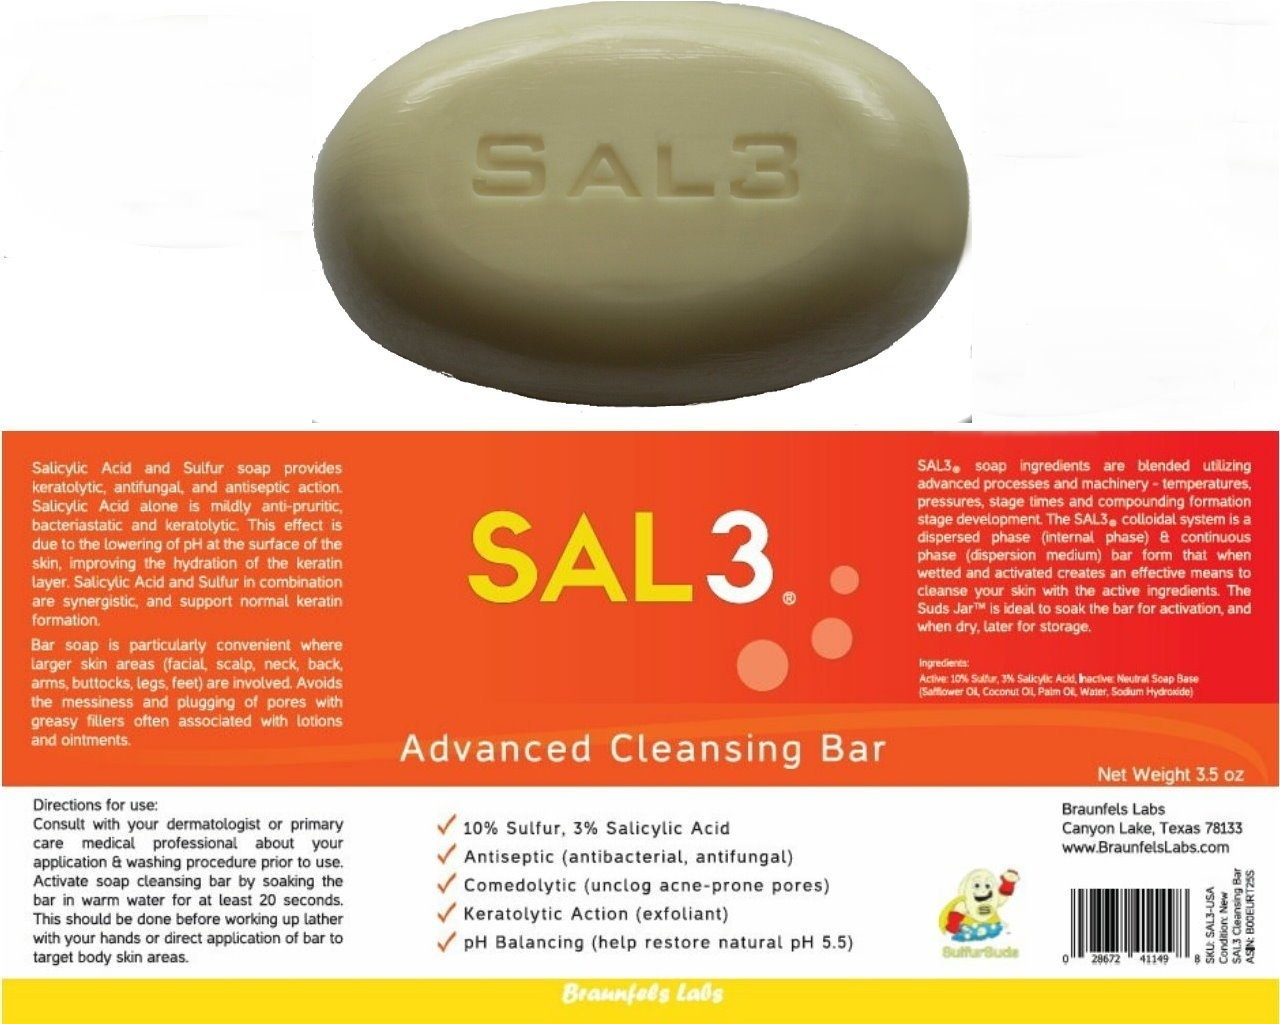 SAL3 Salicylic Acid Sulphur Soap Bar - Special Wash: Acne, Dandruff, Smelly  Scalp and Body,Tinea Versicolor, Oily Skin, Itch, Anti-fungal